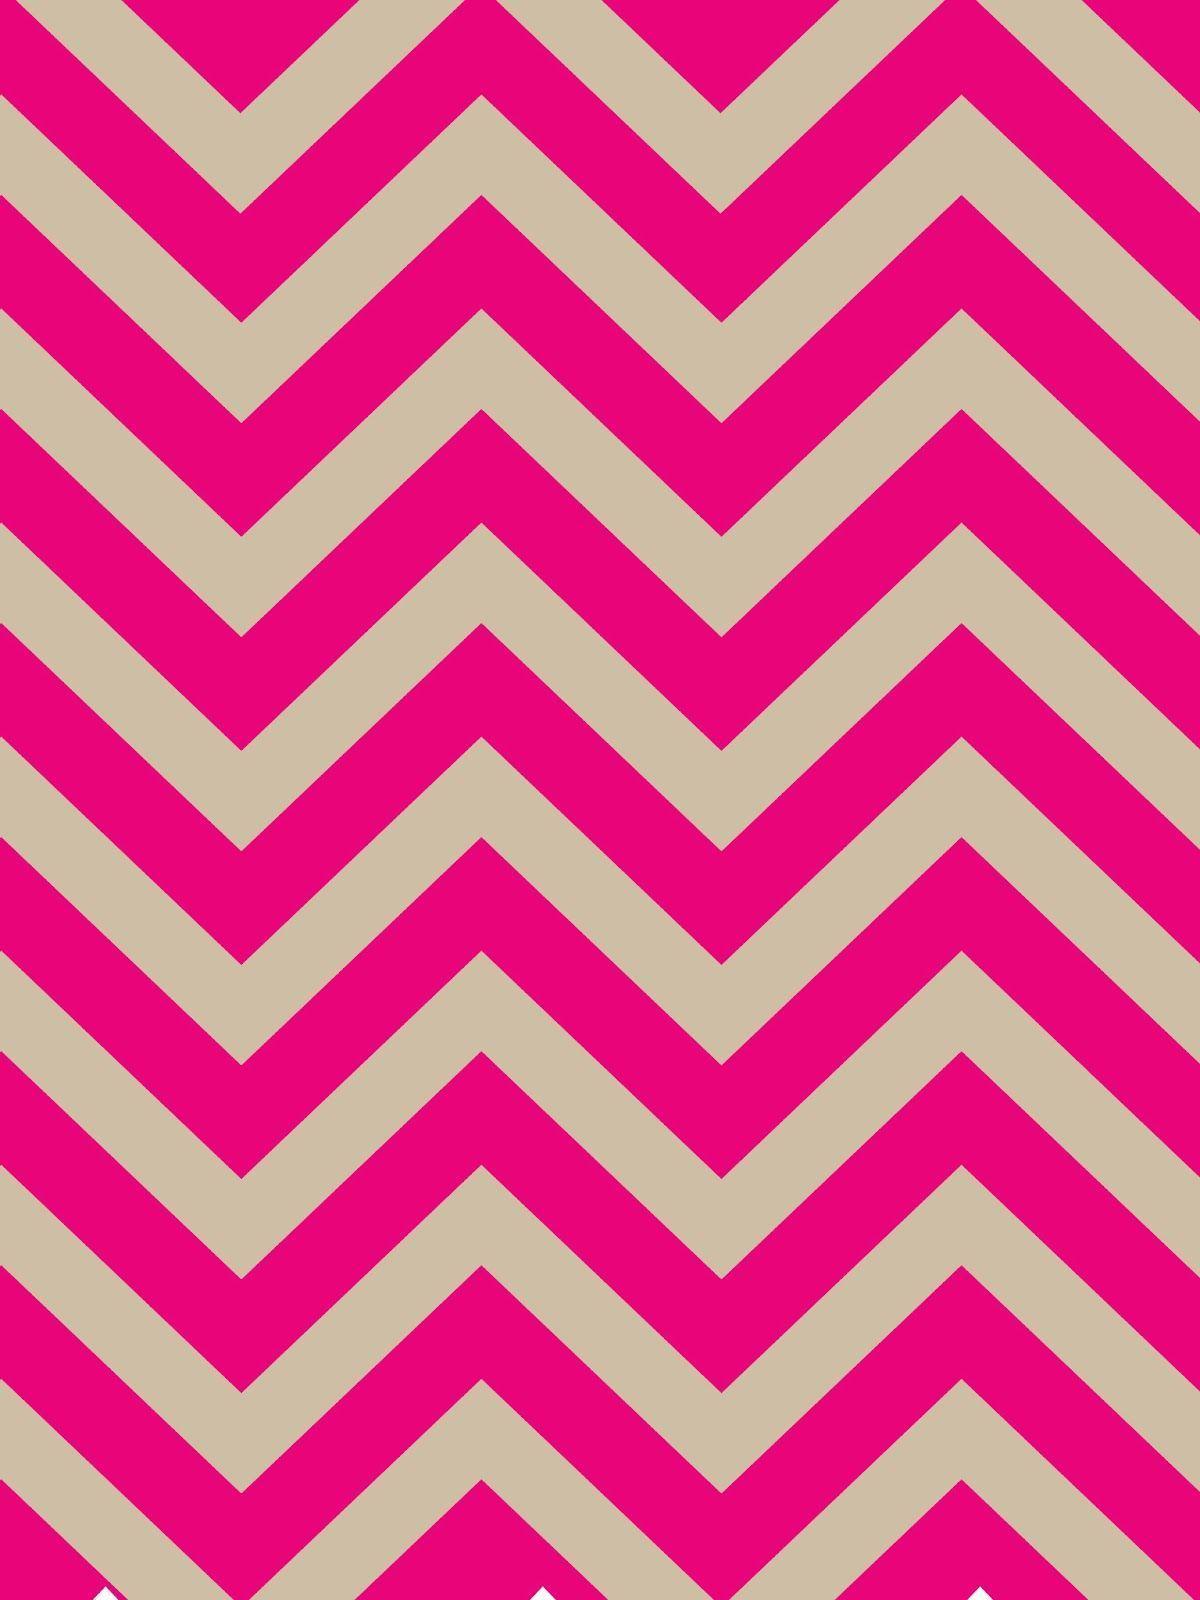 Solid Hot Pink Wallpaper Ecrg